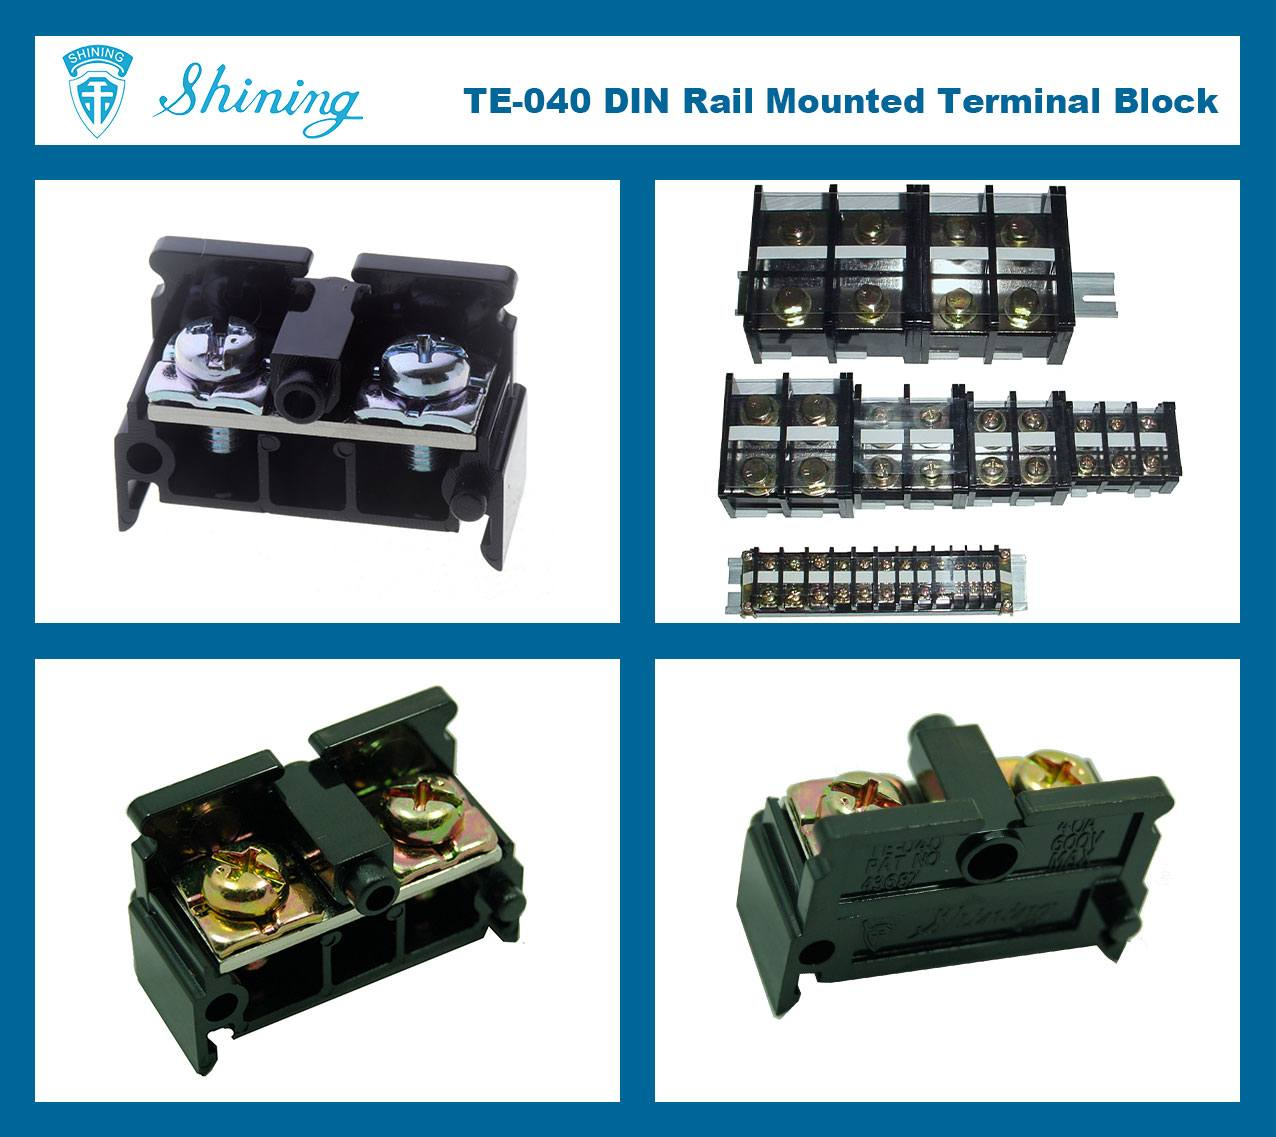 SHINING-TE-040-35mm-Din-Rail-Mounted-Assembly-Type-600V-40A-Terminal-Strip